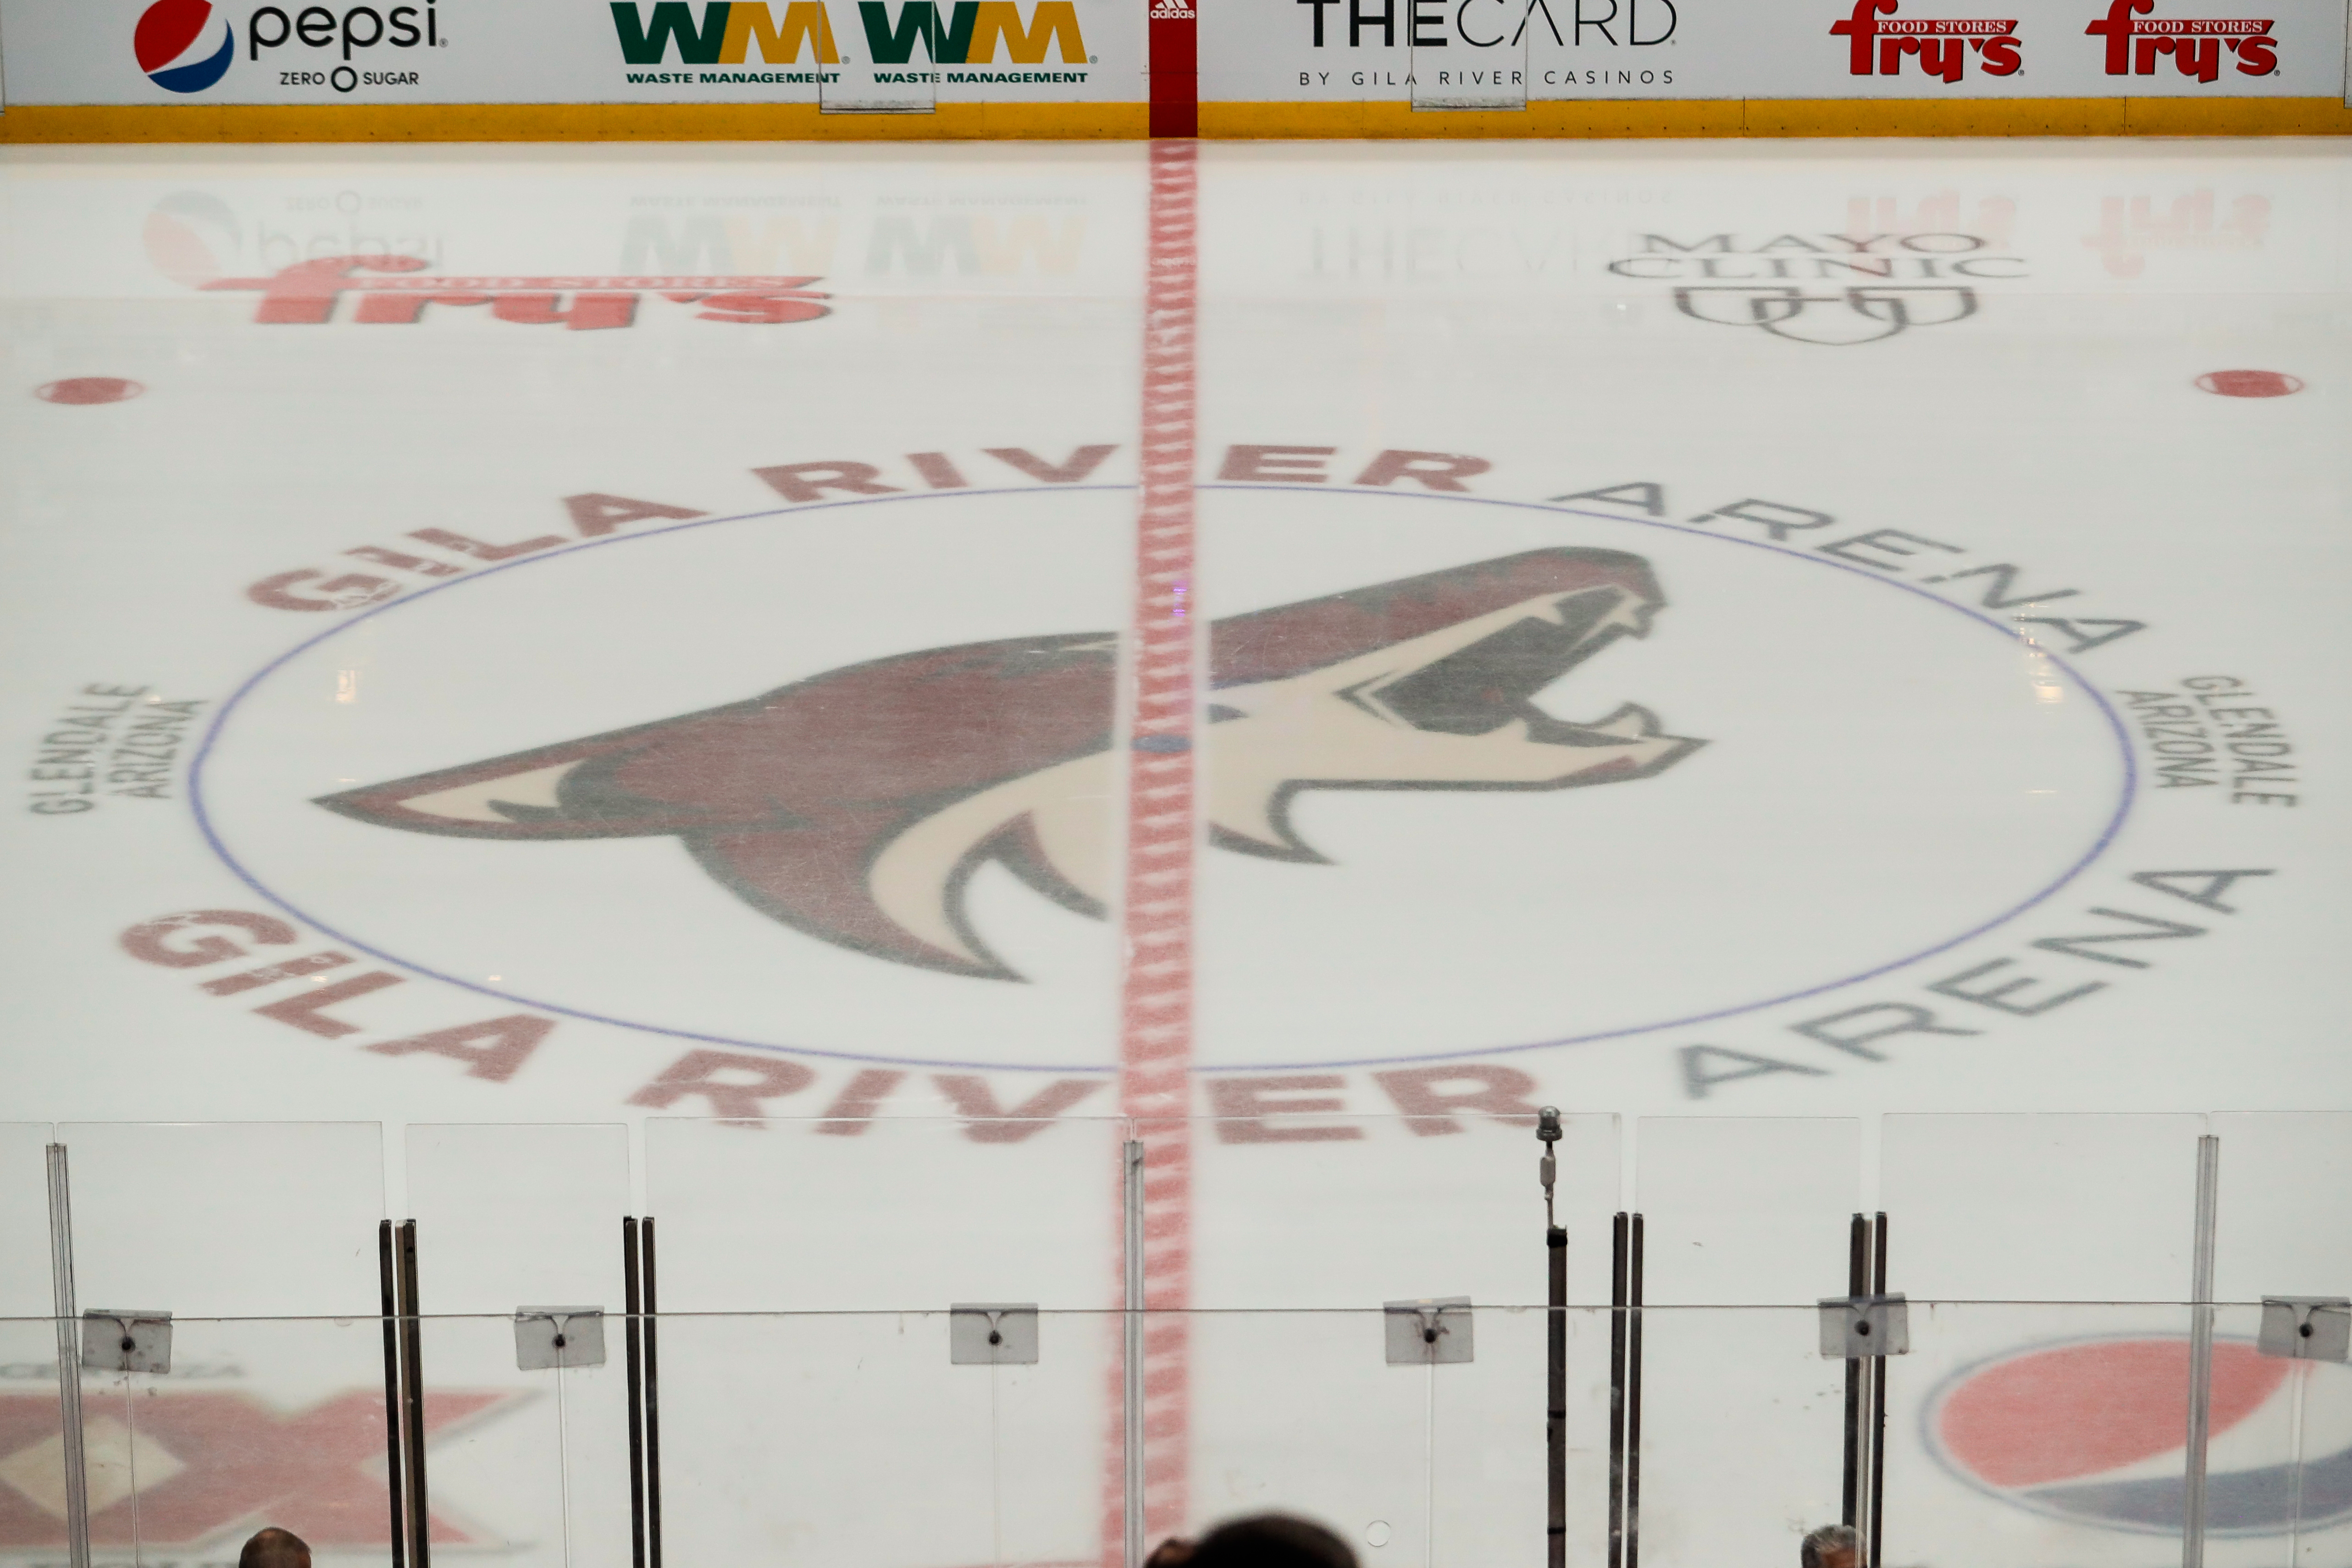 NHL: MAR 26 Blackhawks at Coyotes